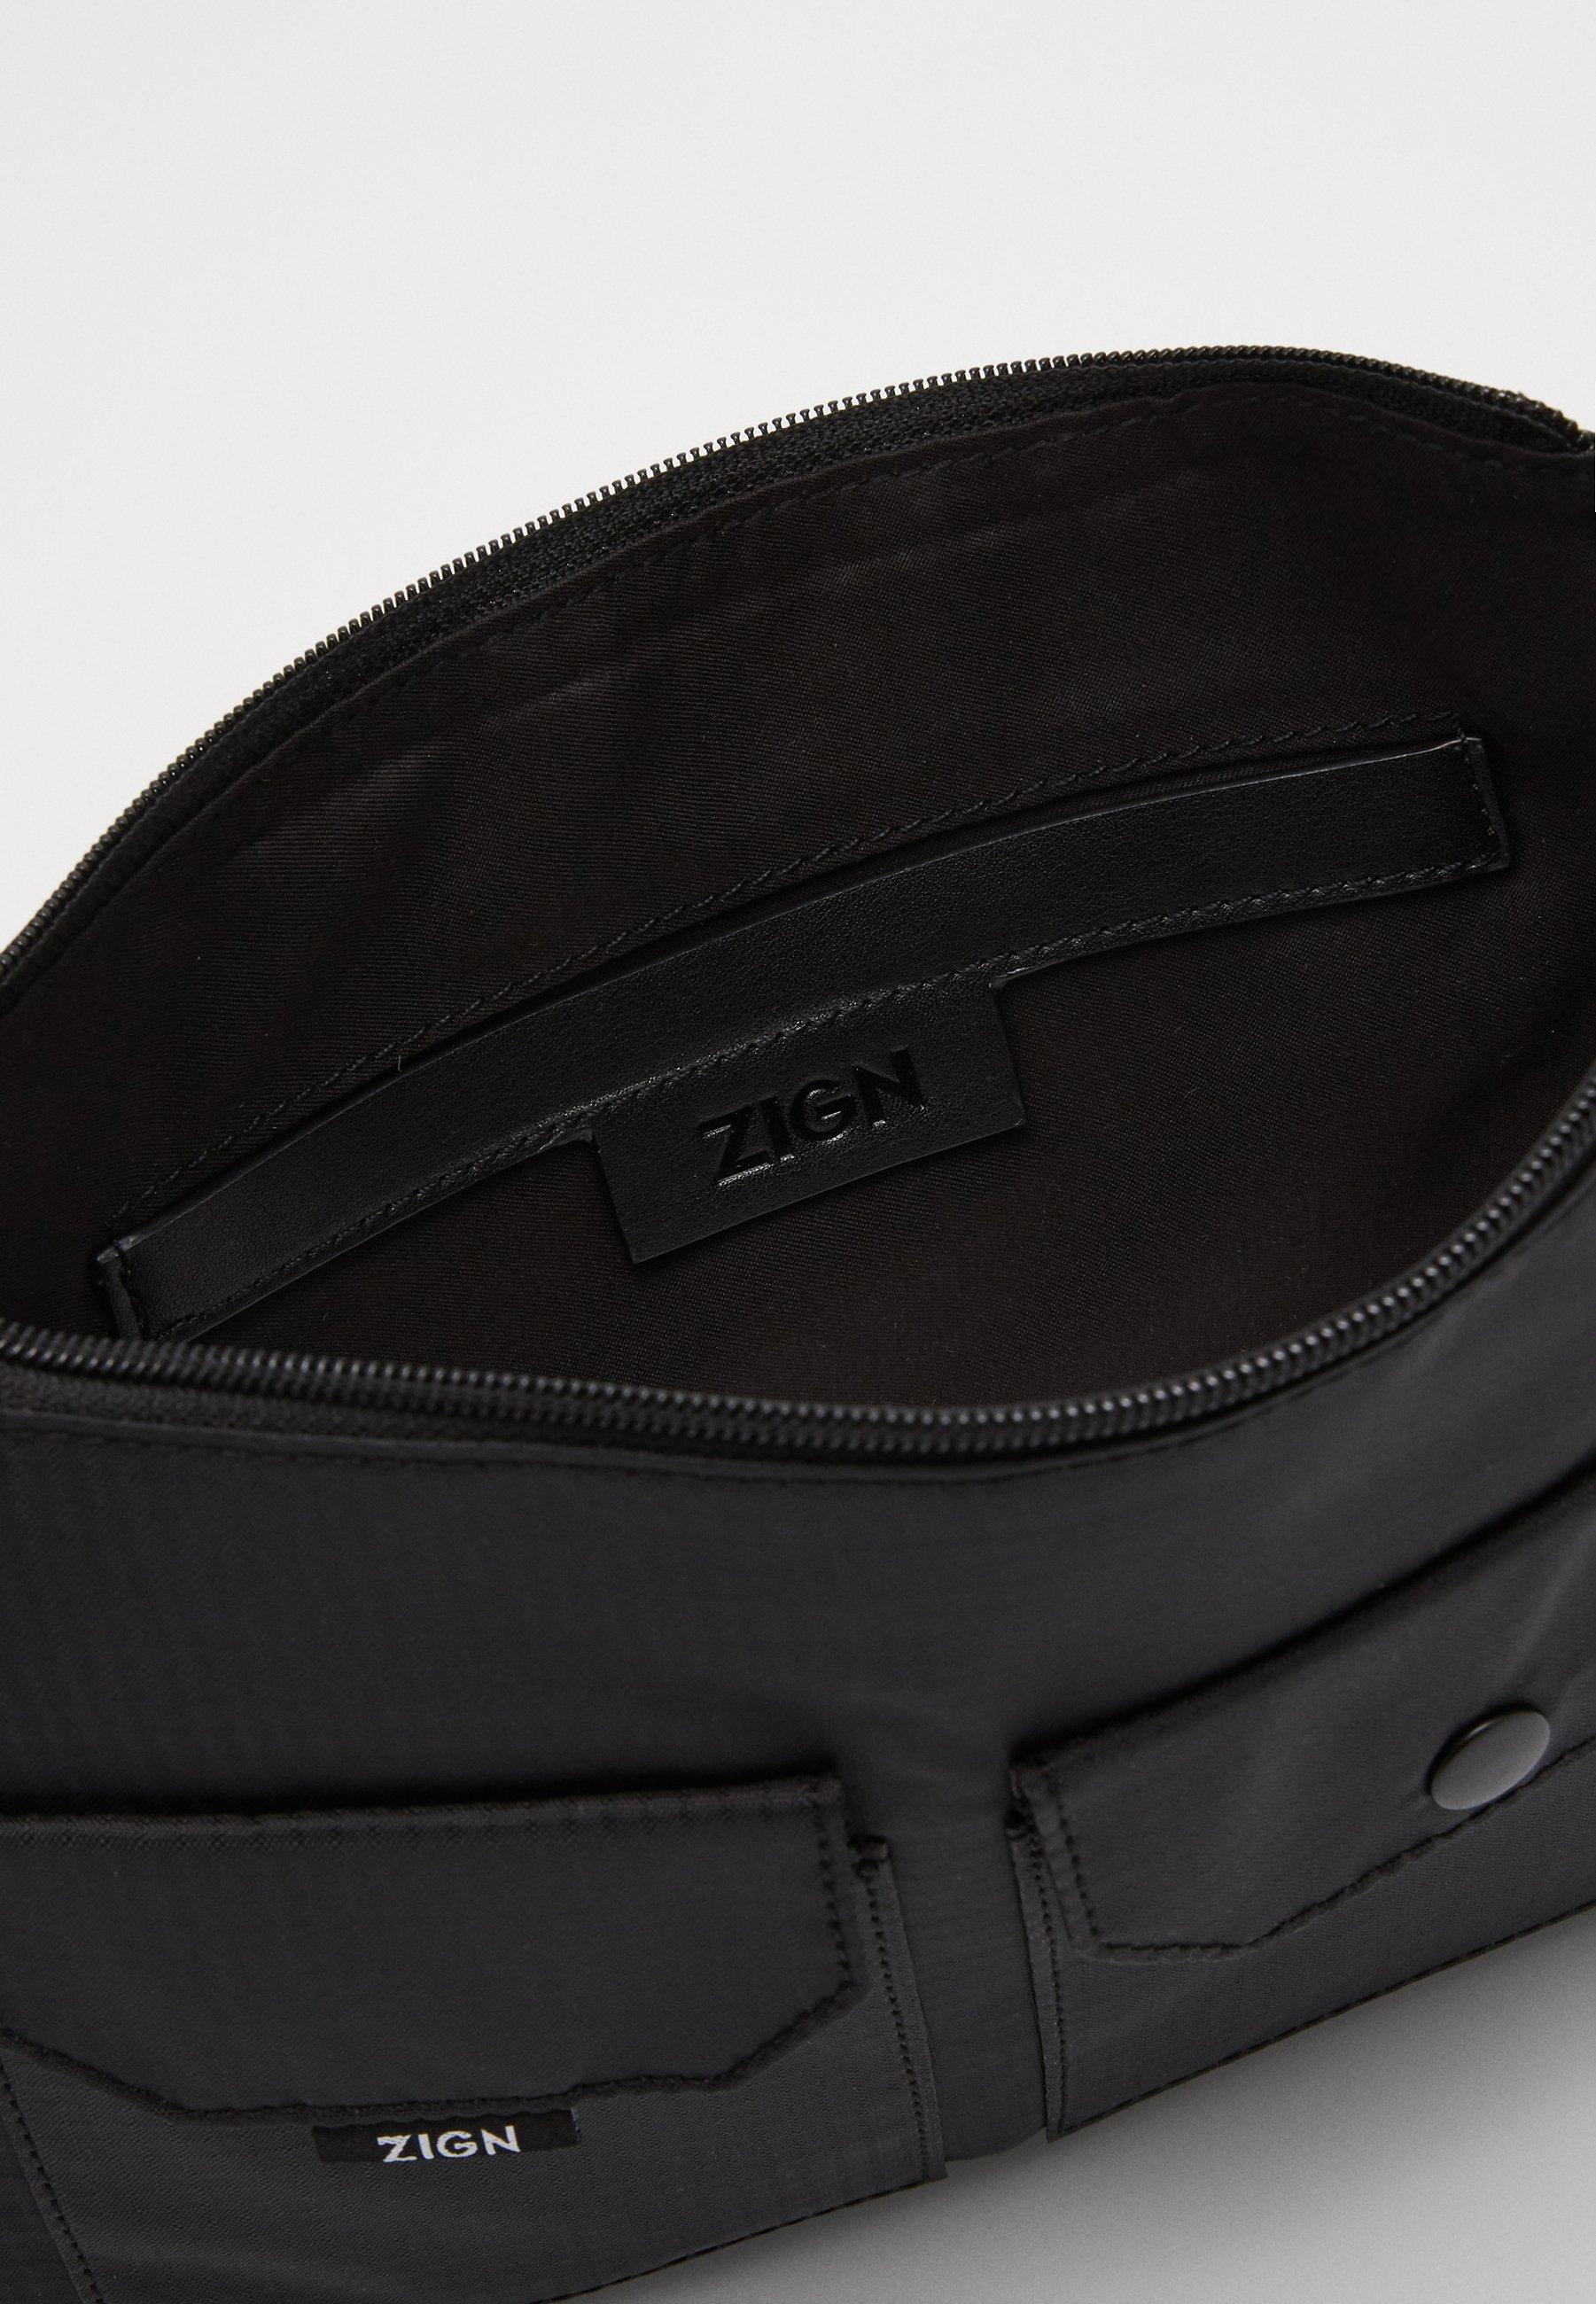 Zign Skulderveske - black/svart X6xHC9aAZLL5iKC